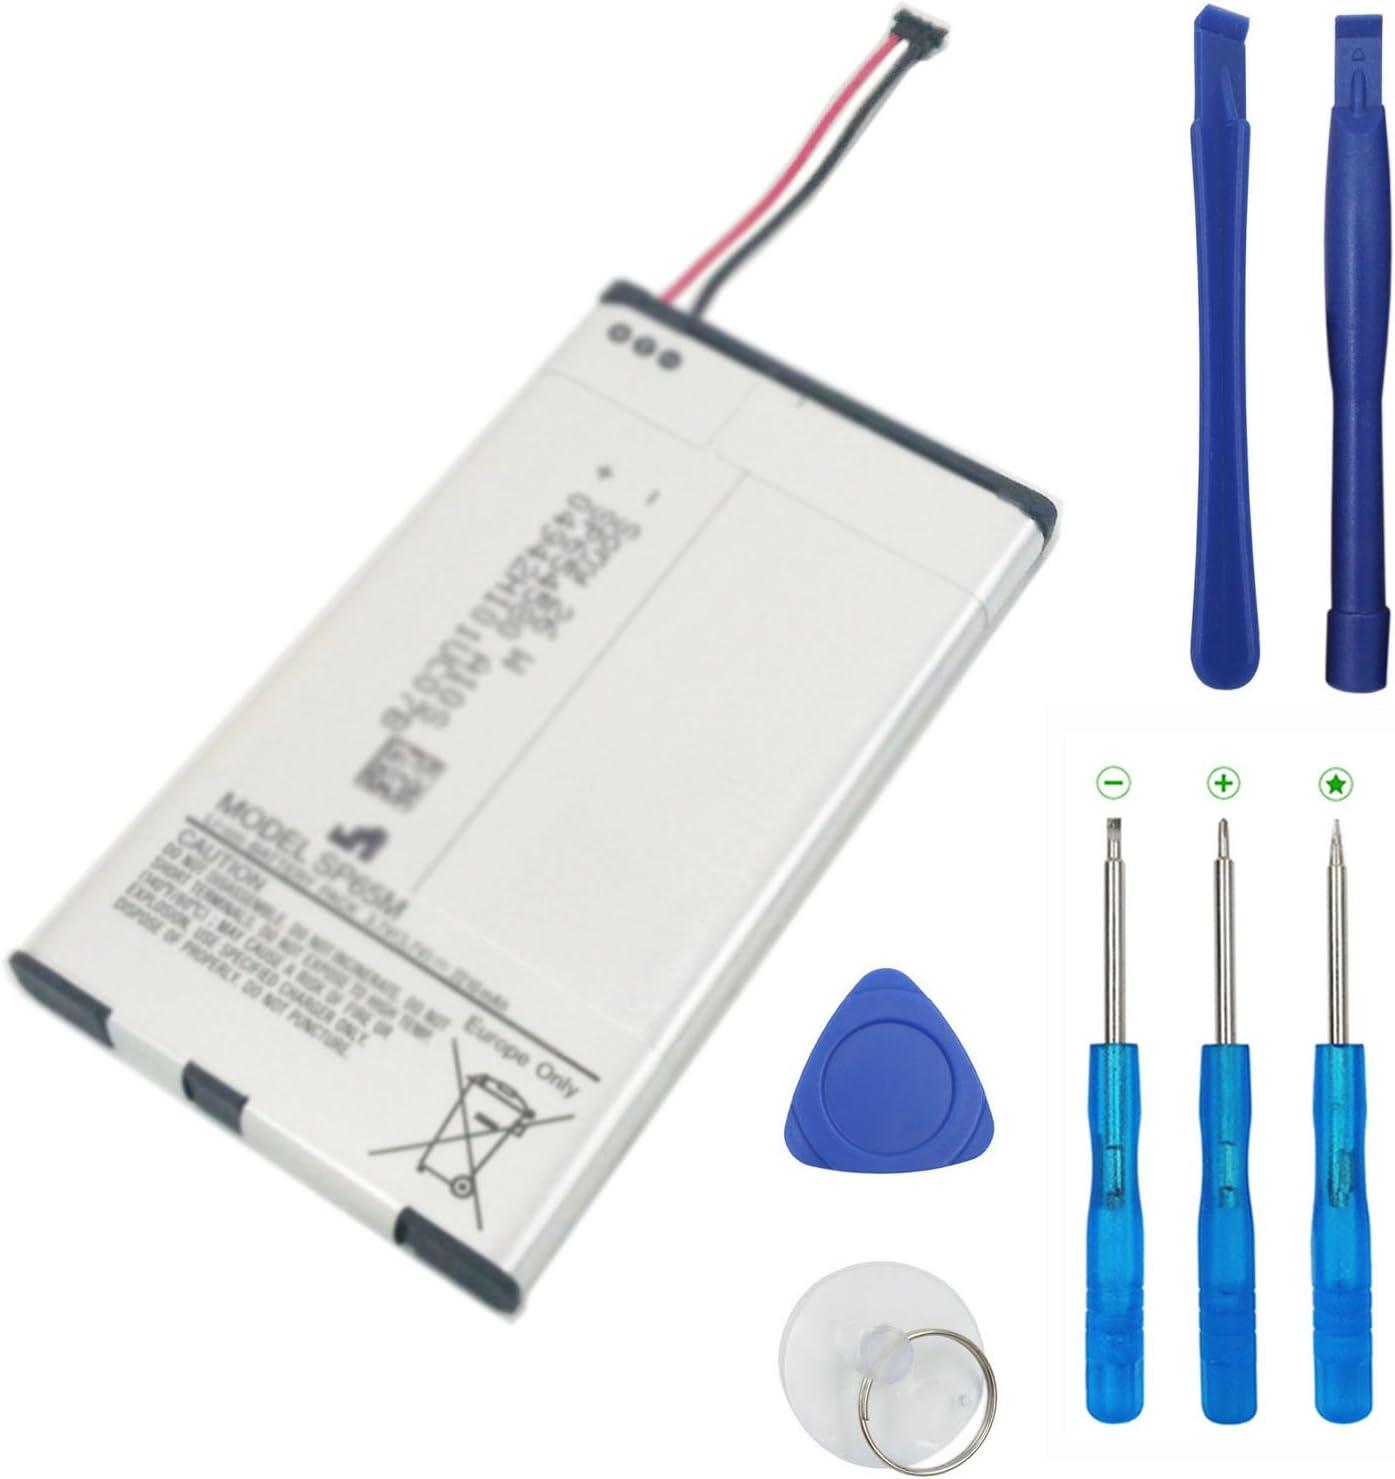 Bateria para Sony PS Vita PCH-1001 PCH-1101 2210mAH